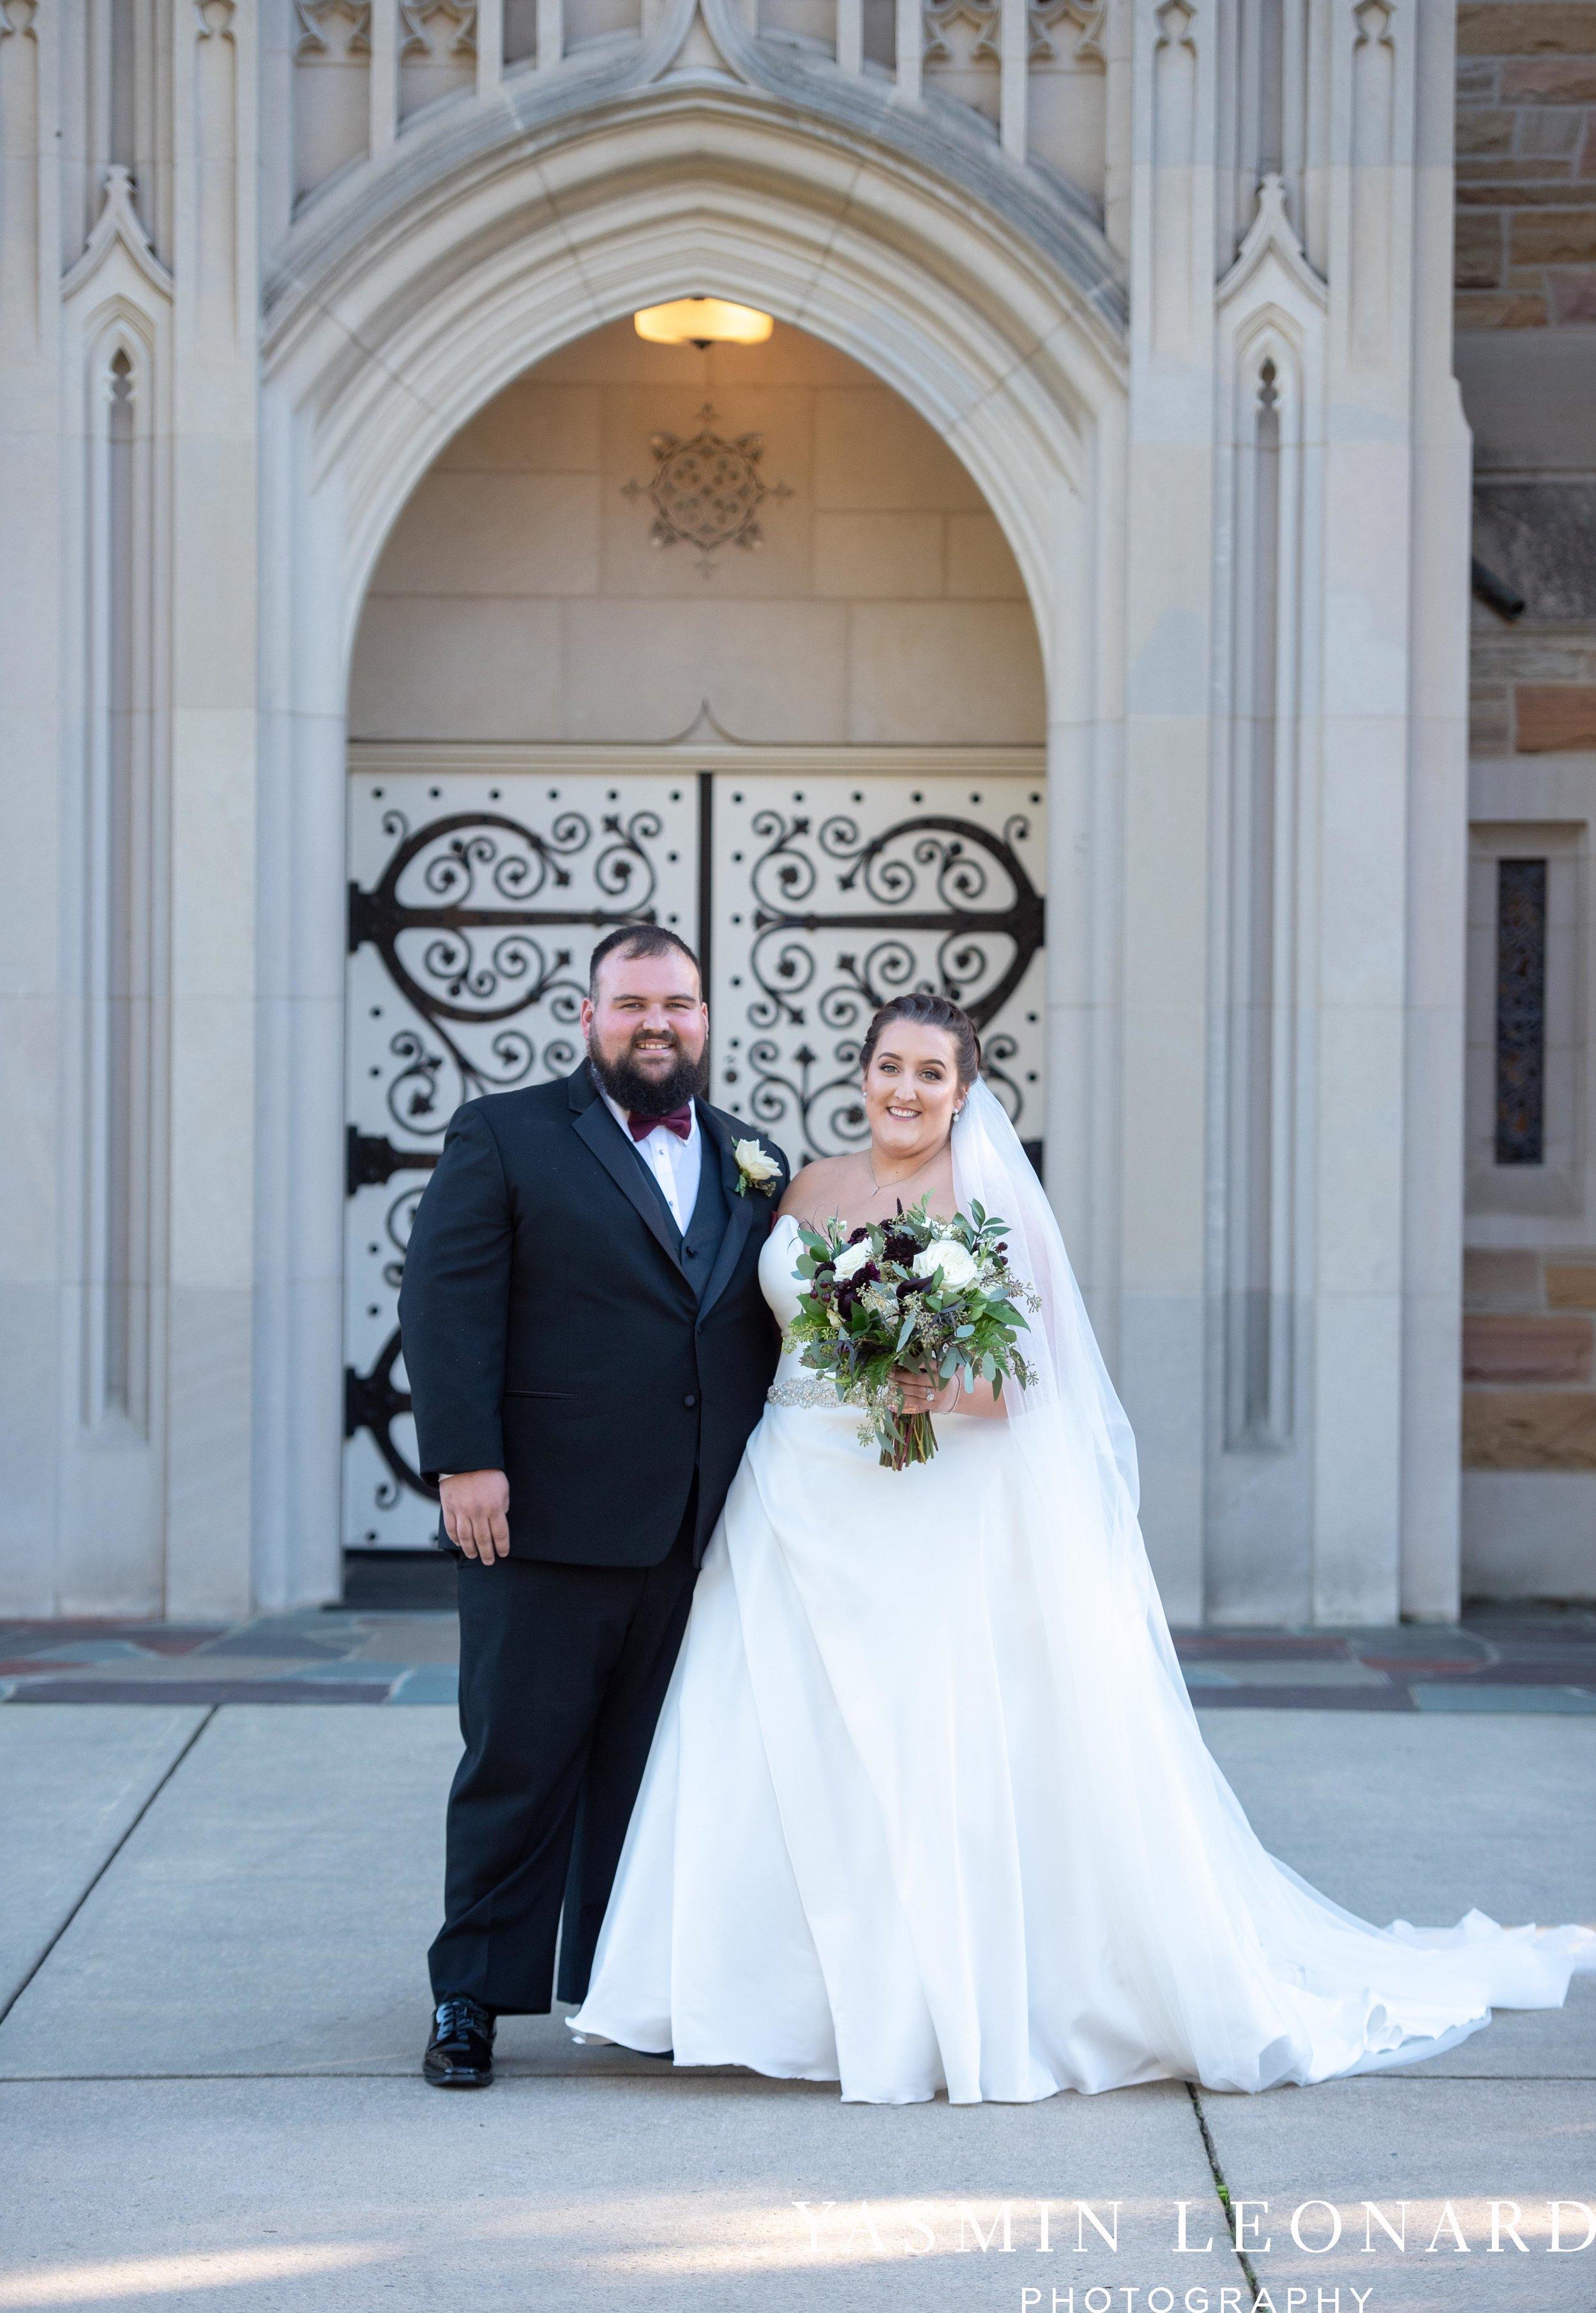 Wesley Memorial United Methodist Church - Old Homeplace Winery - High Point Weddings - High Point Wedding Photographer - NC Weddings - NC Barn Venue - Yasmin Leonard Photography-28.jpg